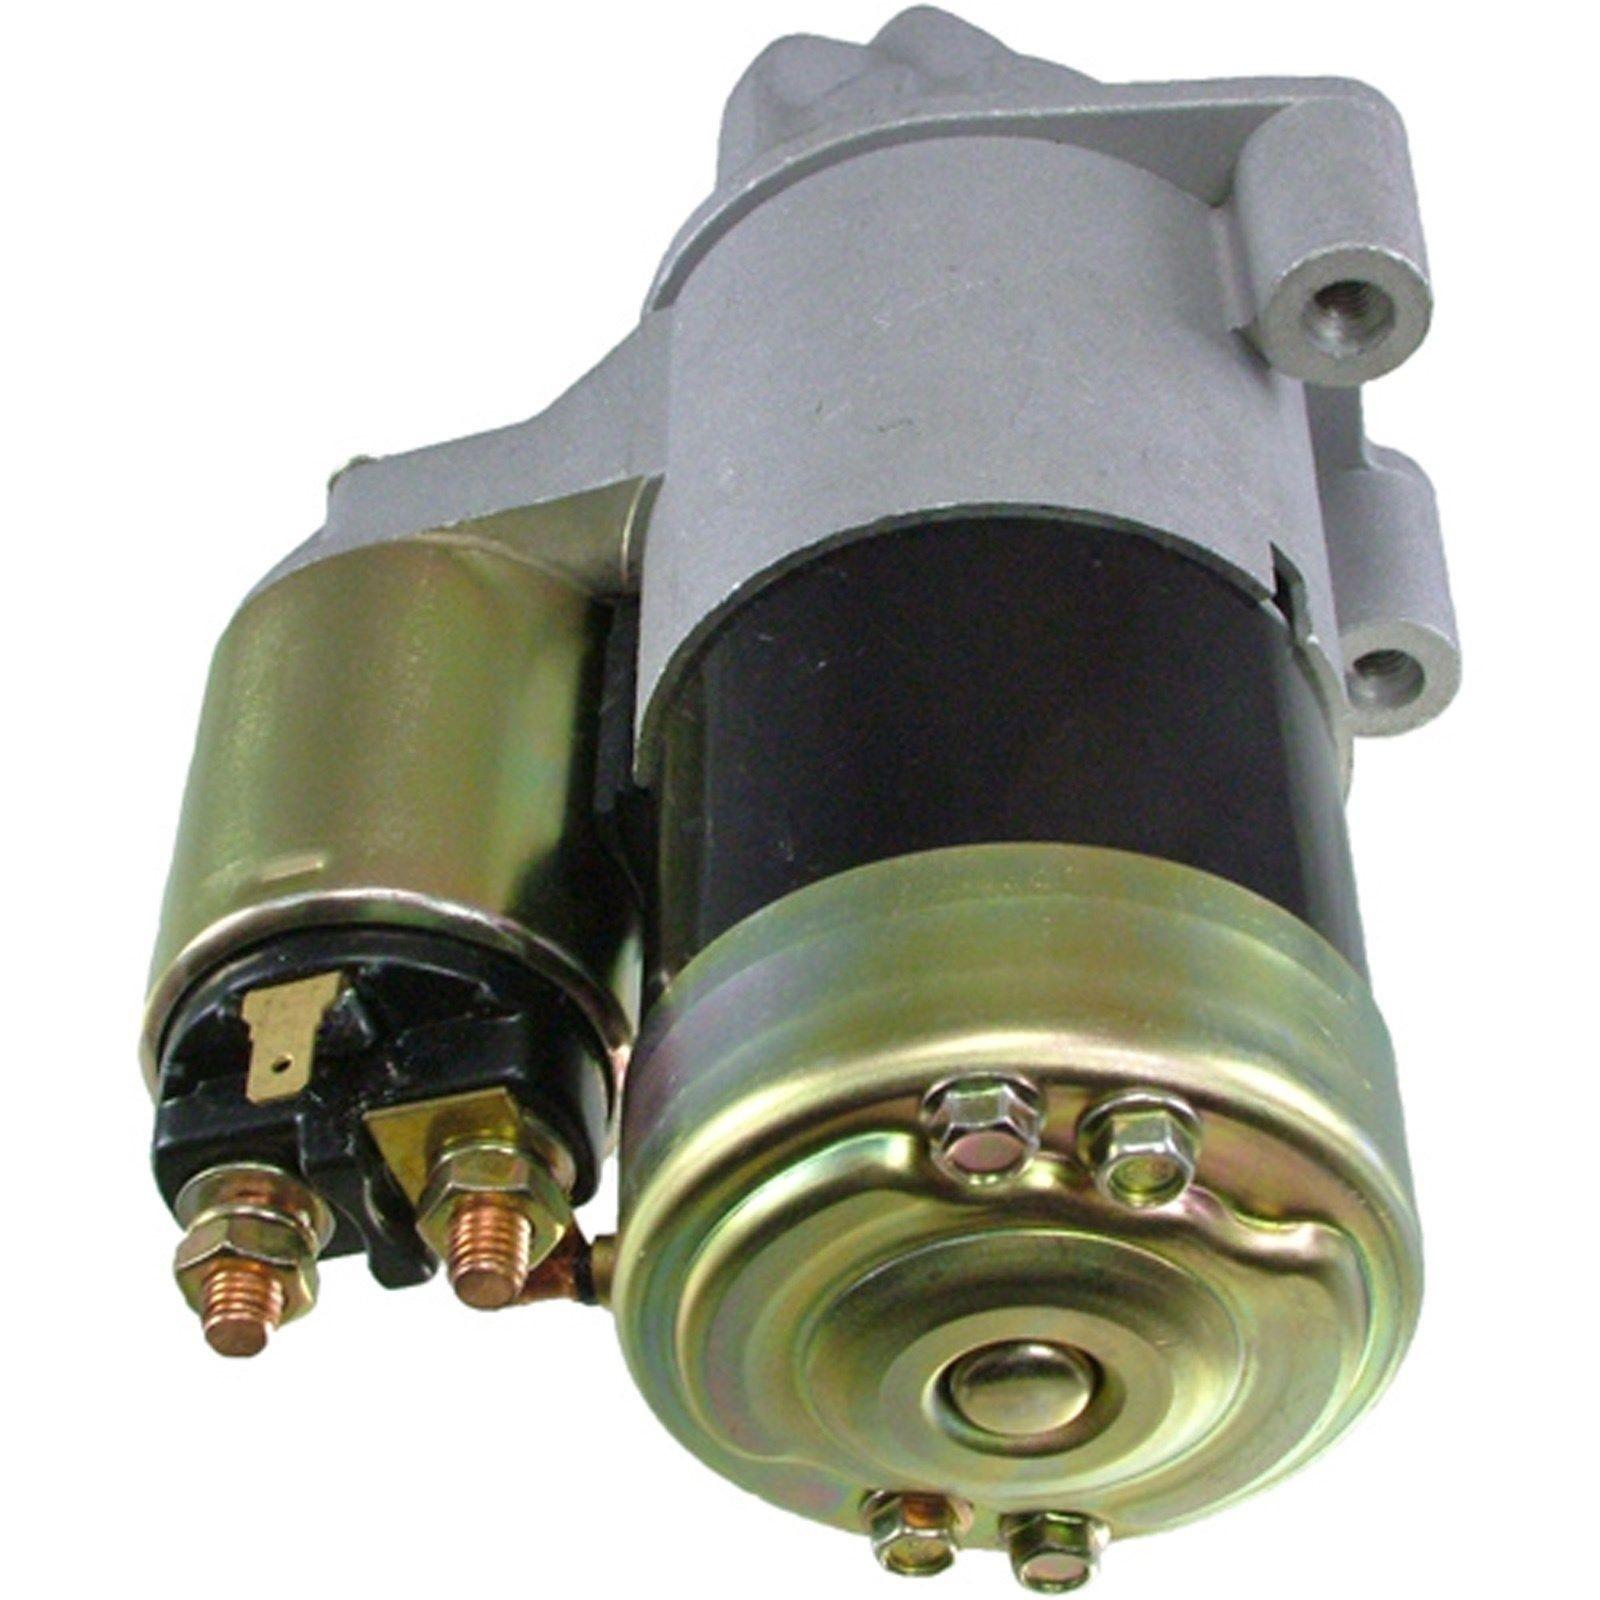 Onan P216 Parts Breakdown Wiring Diagram Engine Starter For John Deere Of 1600x1600